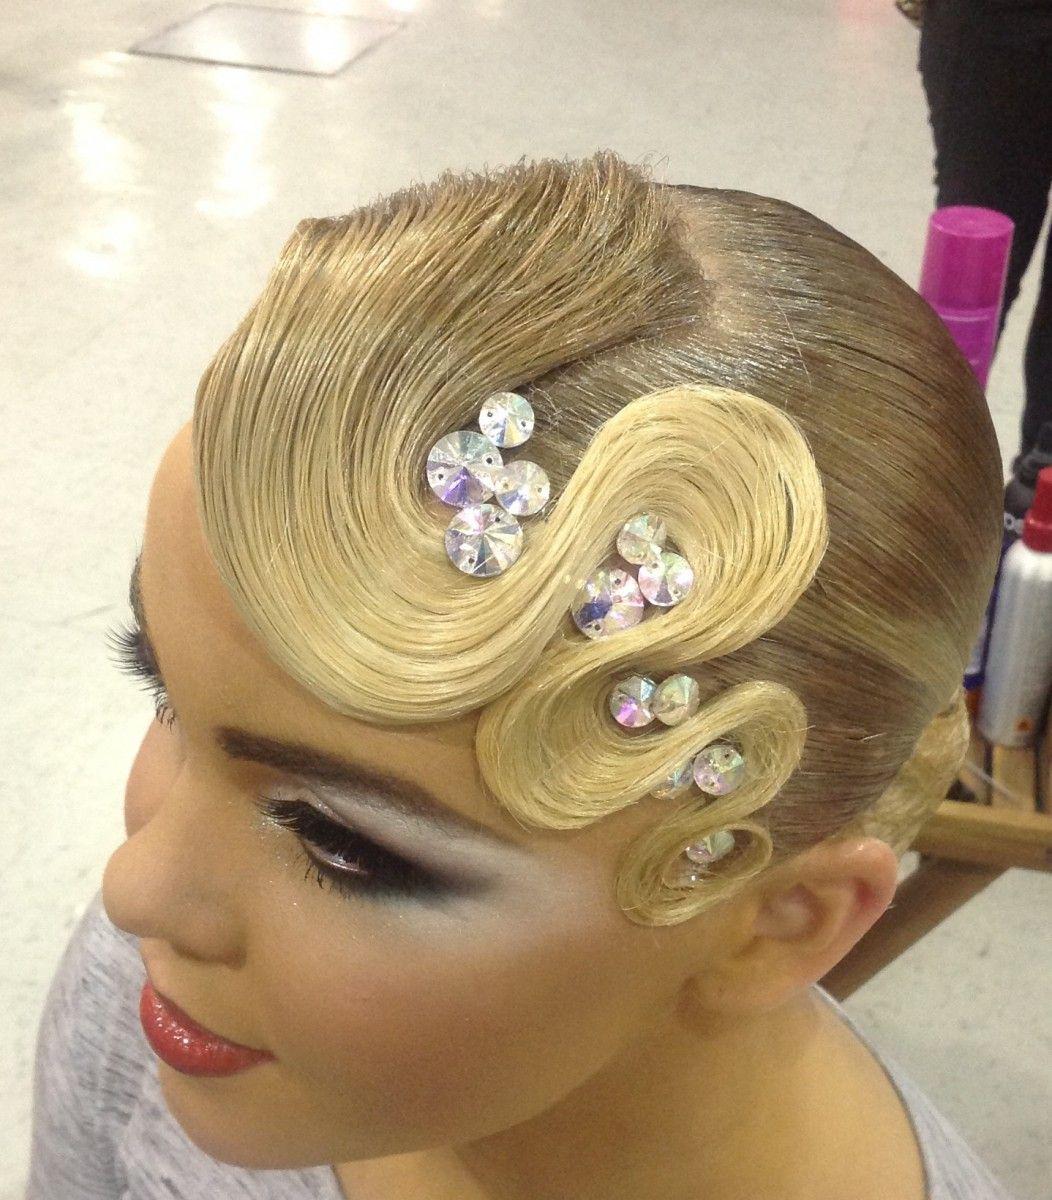 Dance Images Julia Karaseva Dance Competition Hair Competition Hair Dance Hairstyles